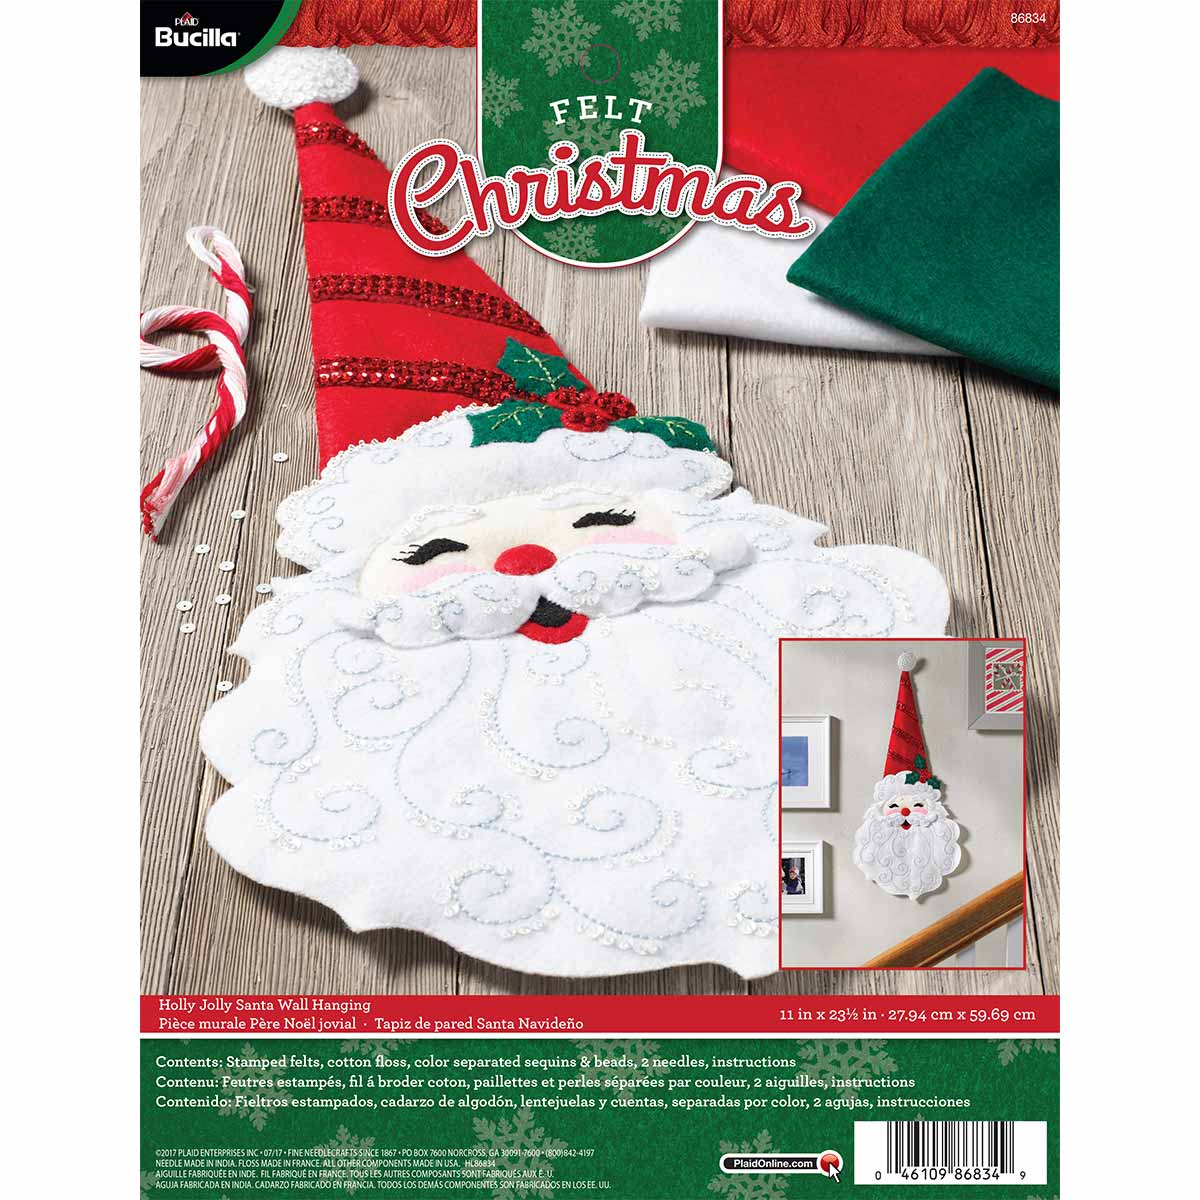 Bucilla ® Seasonal - Felt - Home Decor - Door/Wall Hanging Kits - Holly Jolly Santa